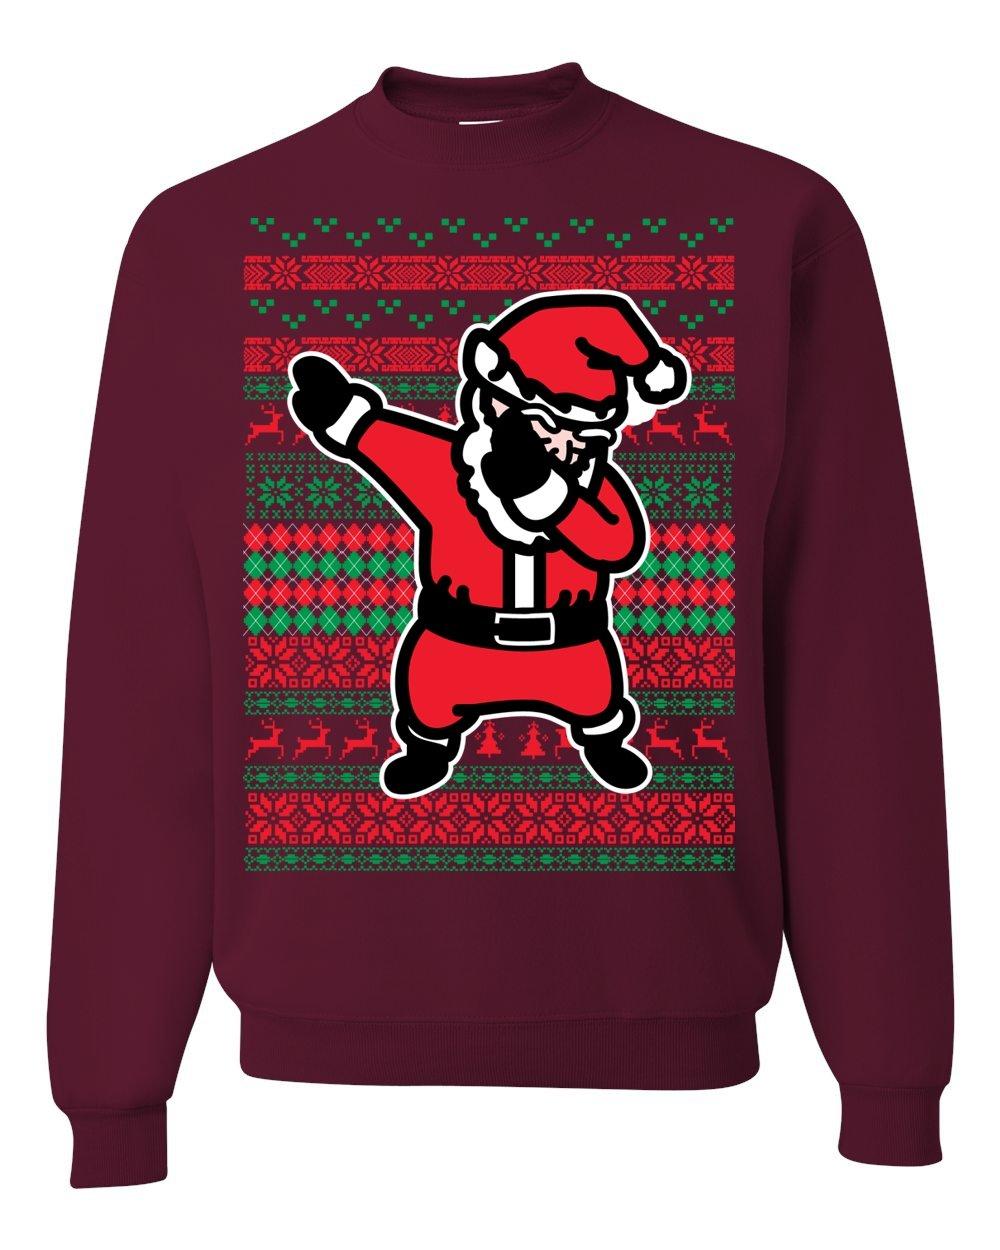 Dabbing Santa Ugly Christmas Sweater Unisex Crewneck Maroon 3971 Shirts